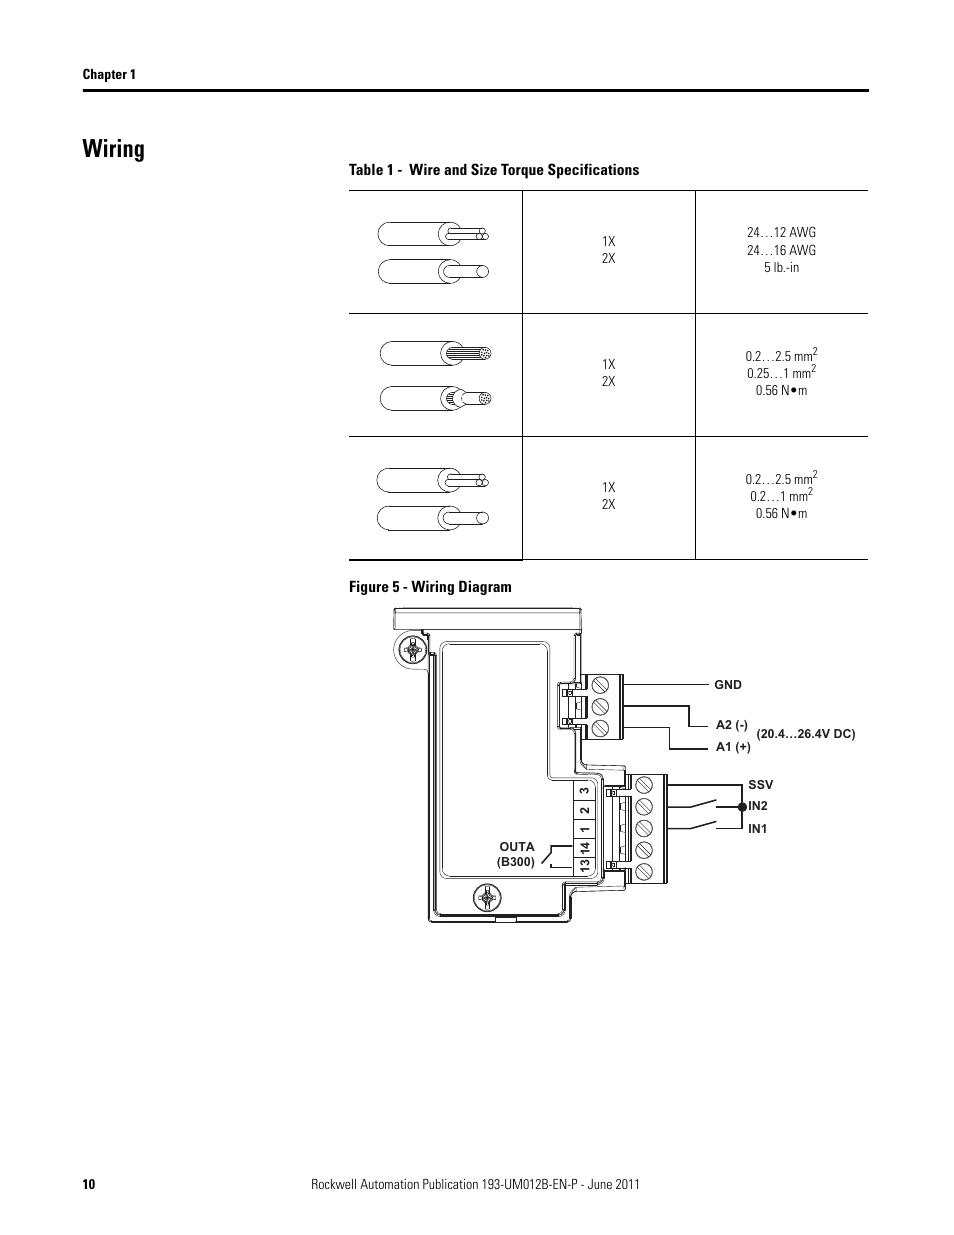 medium resolution of e1 wiring diagram wiring diagram home f21 e1 wiring diagram e1 wiring diagram